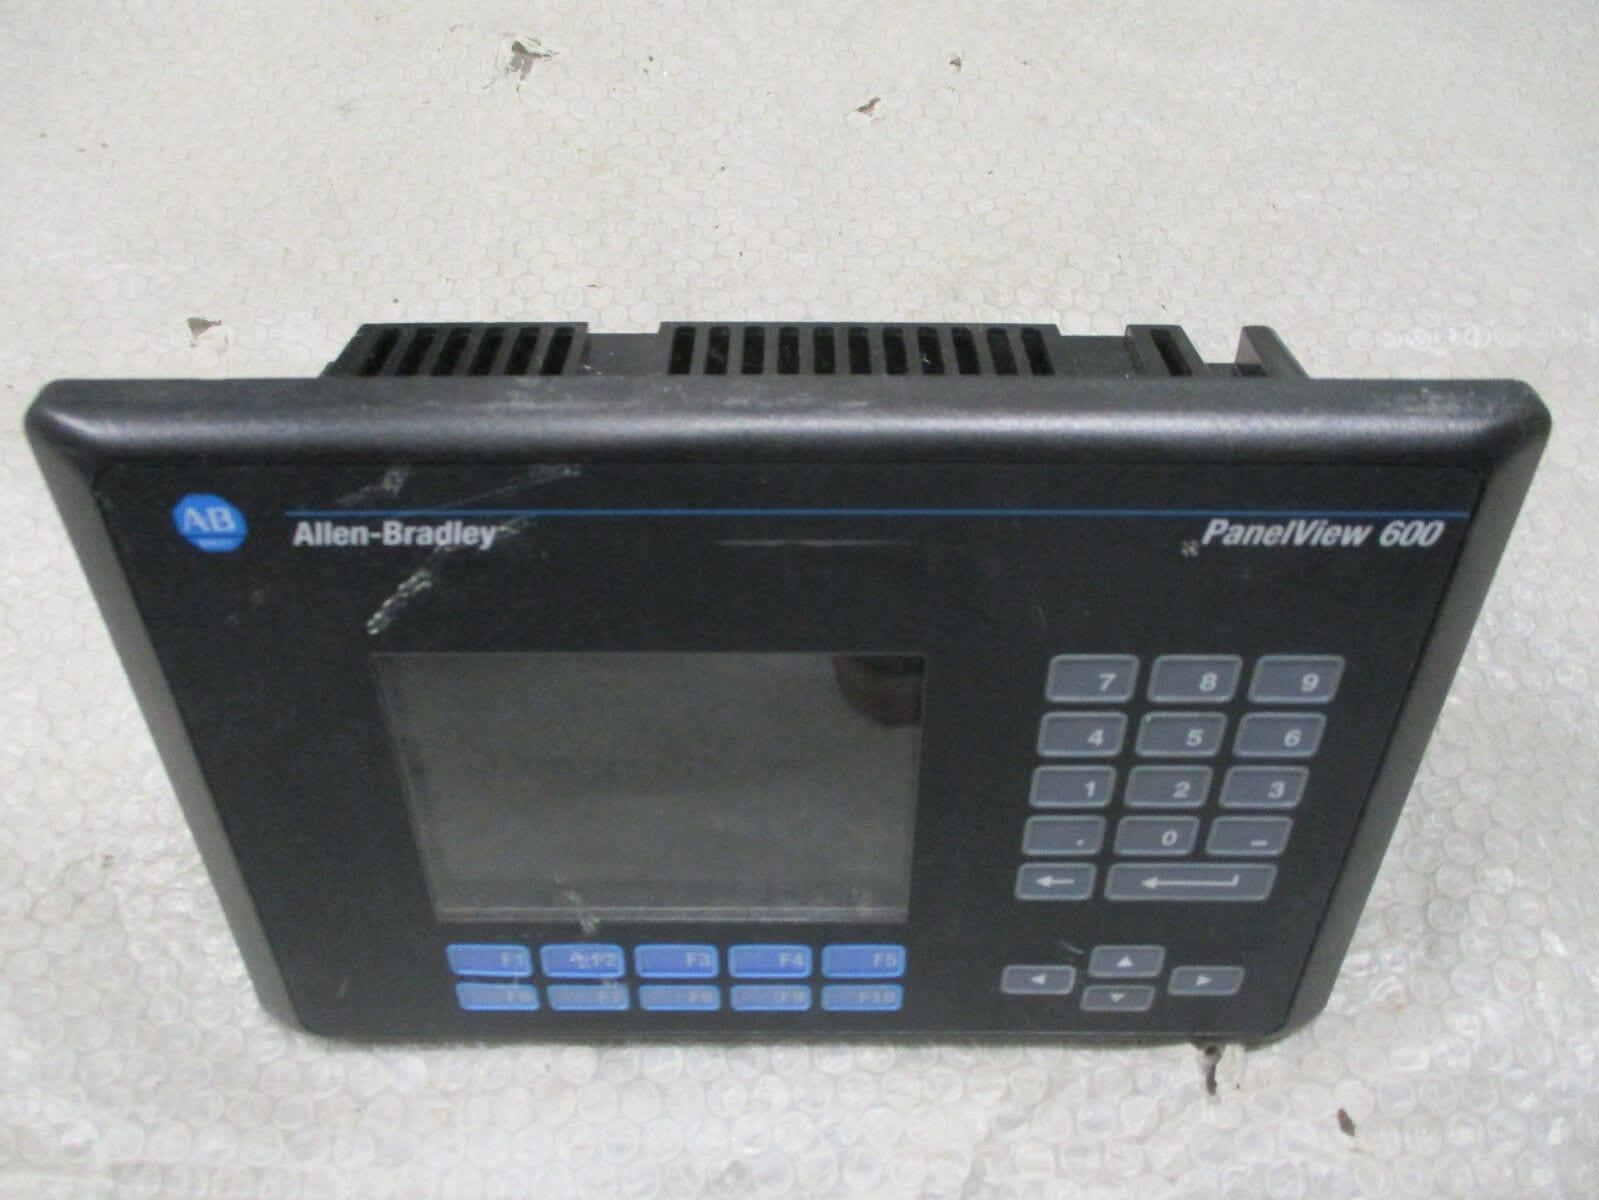 Allen Bradley 2711-K6C1X Panelview 600 Ser C REV D FRN 4 46 100-240VAC  *Tested*